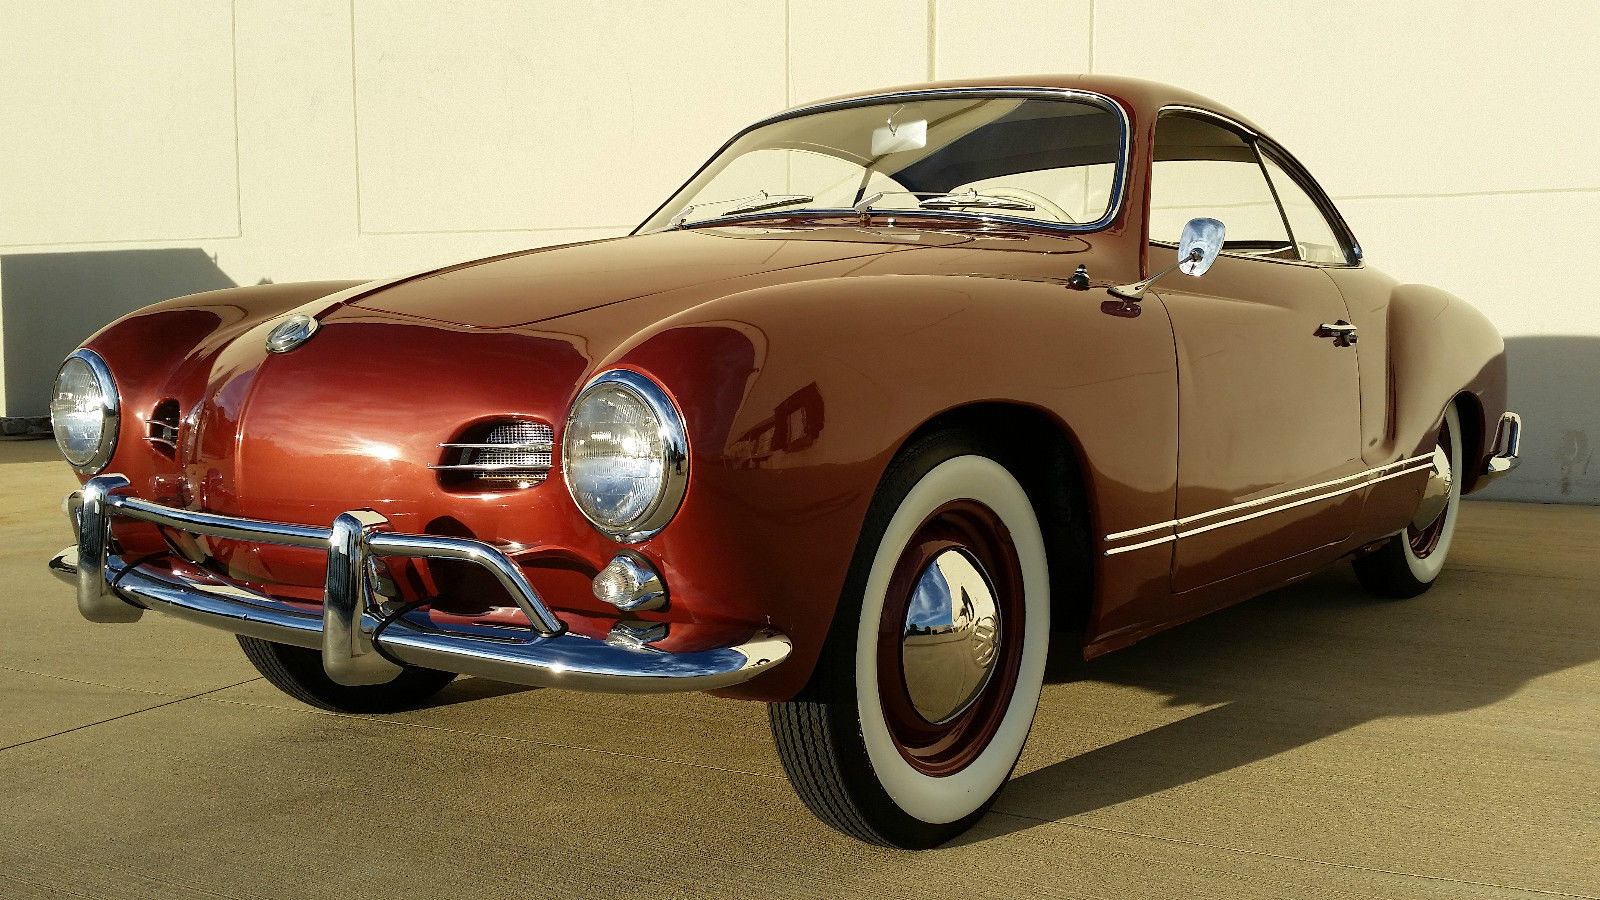 1959 vw karmann ghia low light coupe vw birth cert matching 39 s car restored. Black Bedroom Furniture Sets. Home Design Ideas